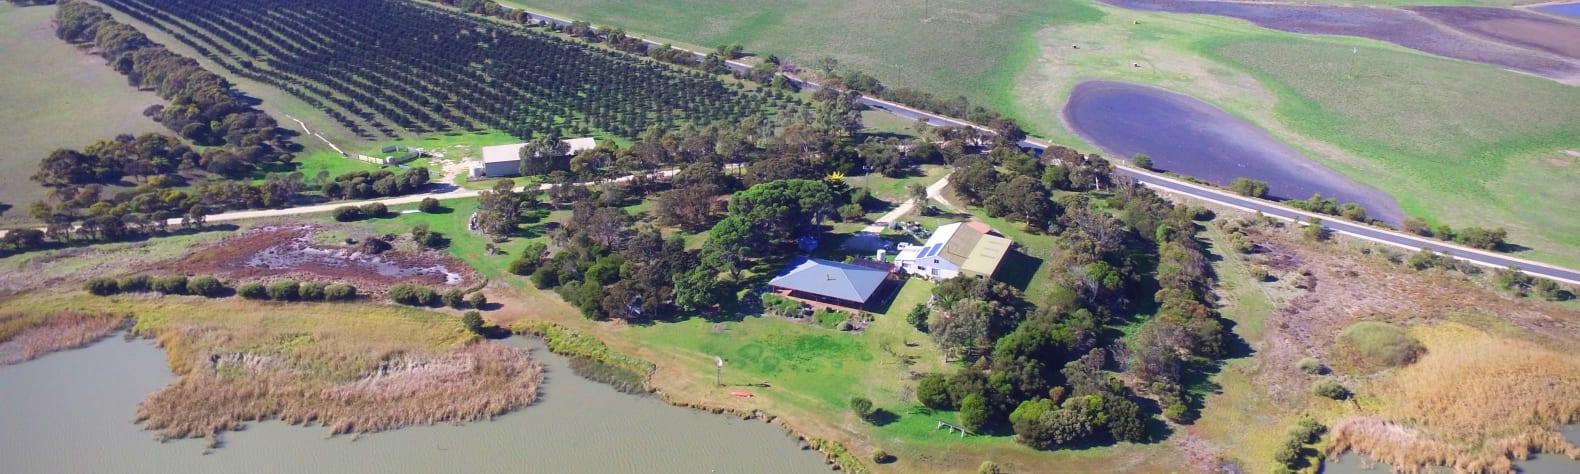 Jury Road Orchard - Farm Stay